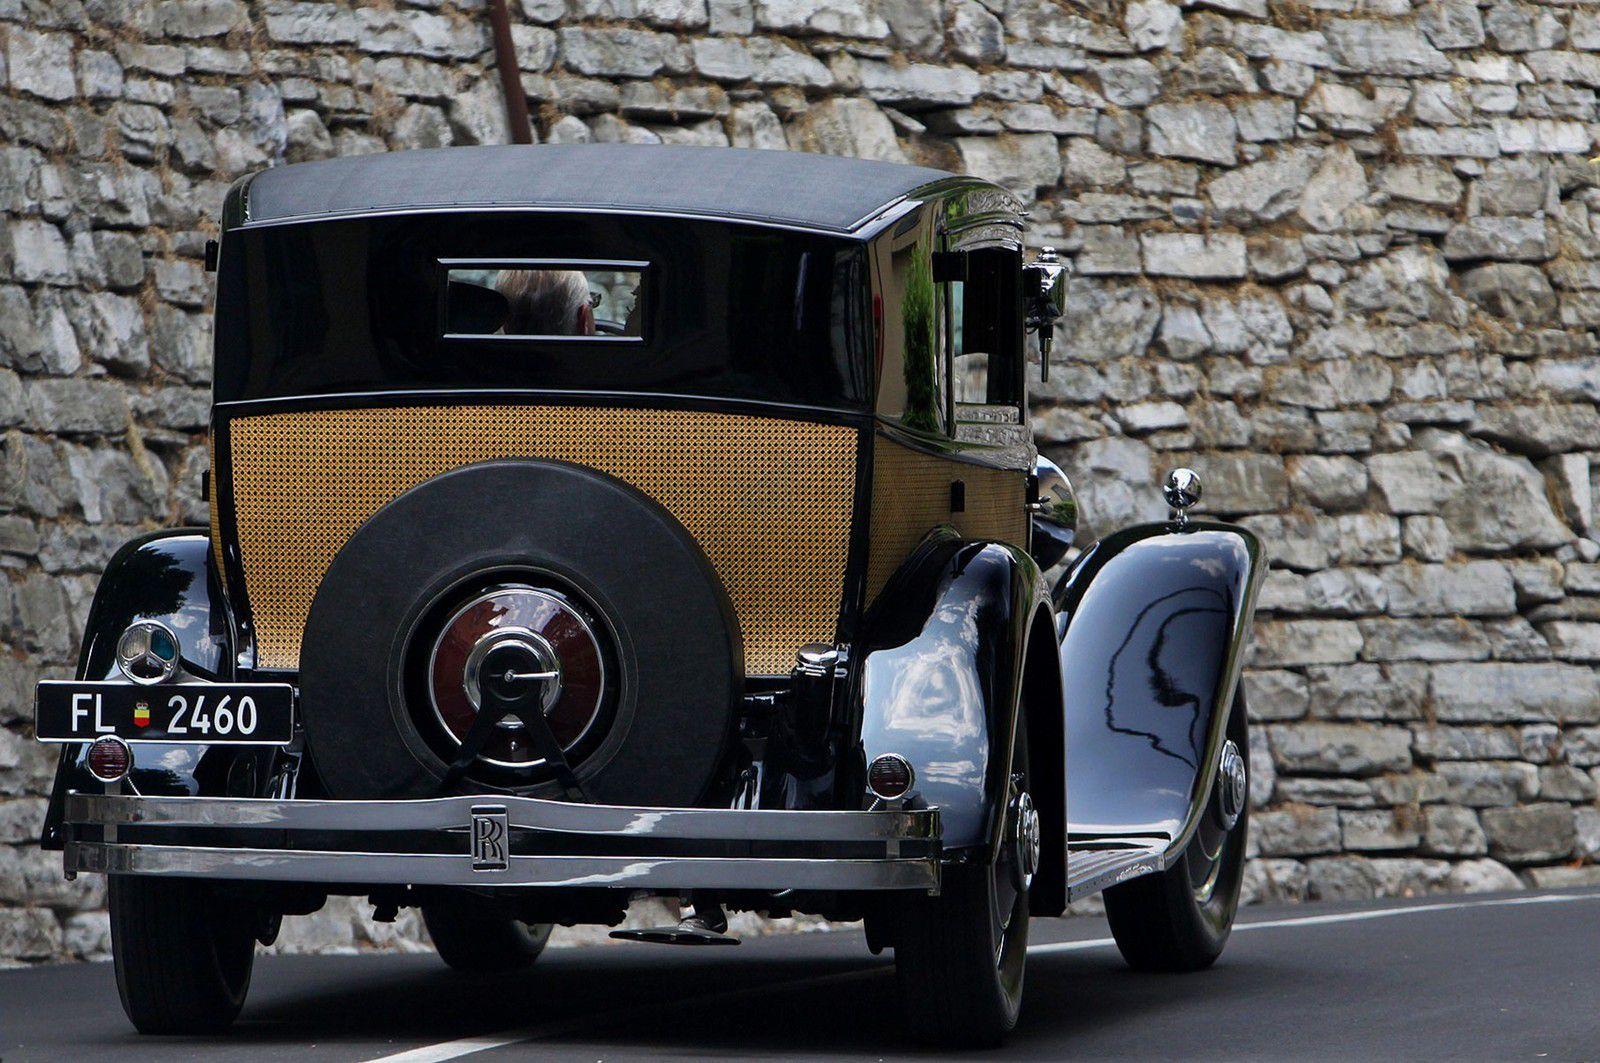 VOITURES DE LEGENDE (1225) : ROLLS-ROYCE  PHANTOM II BREWSTER SPECIAL TOWN CAR - 1933